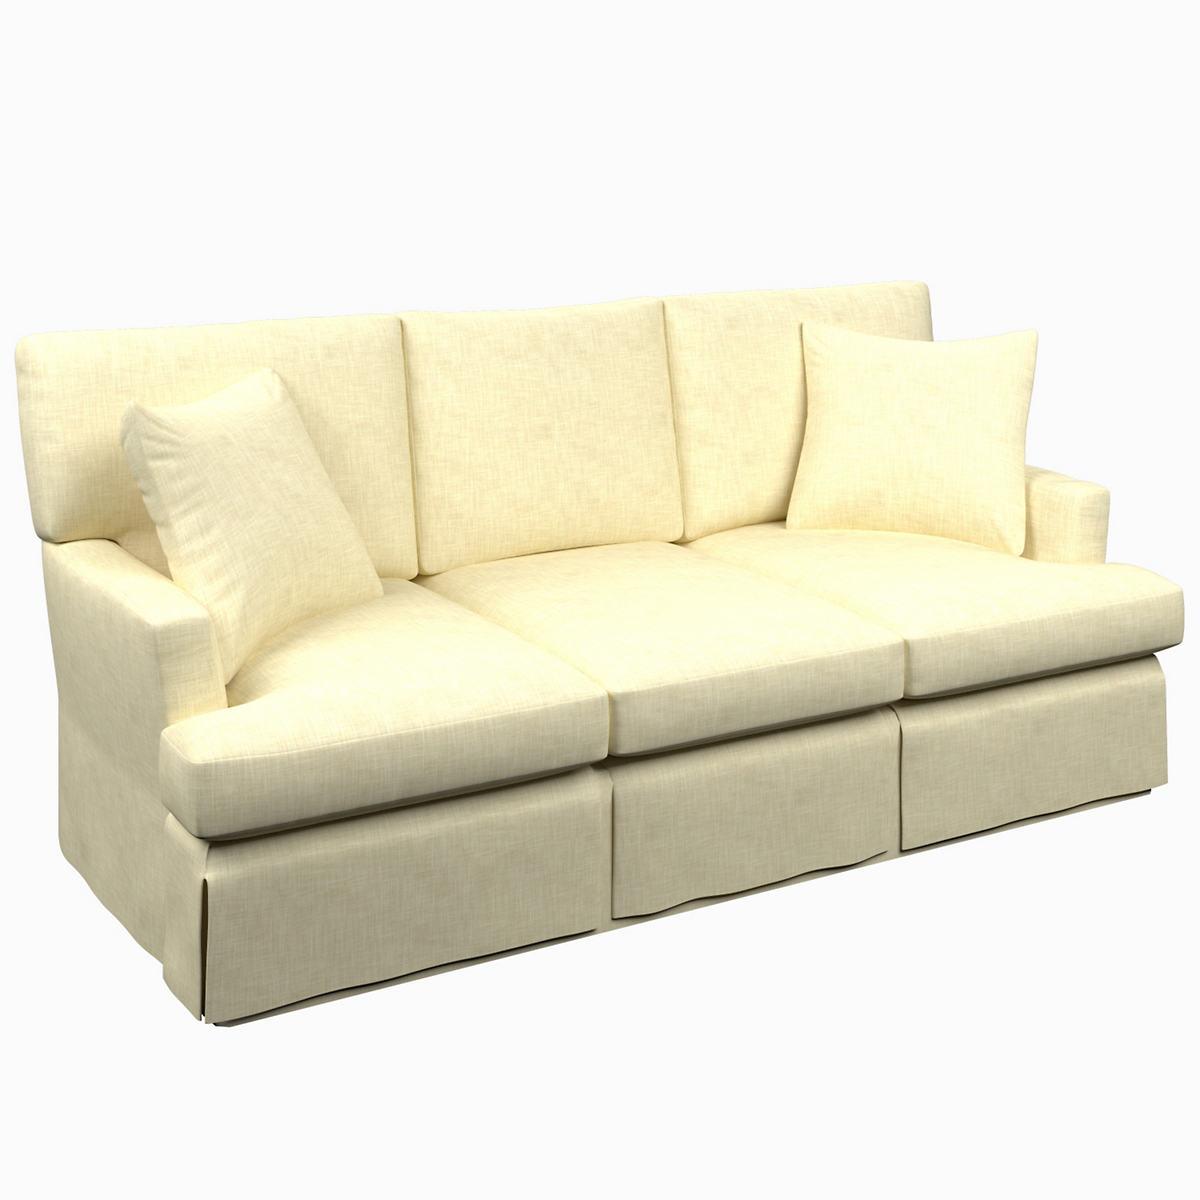 Greylock Ivory Saybrook 3 Seater Slipcovered Sofa